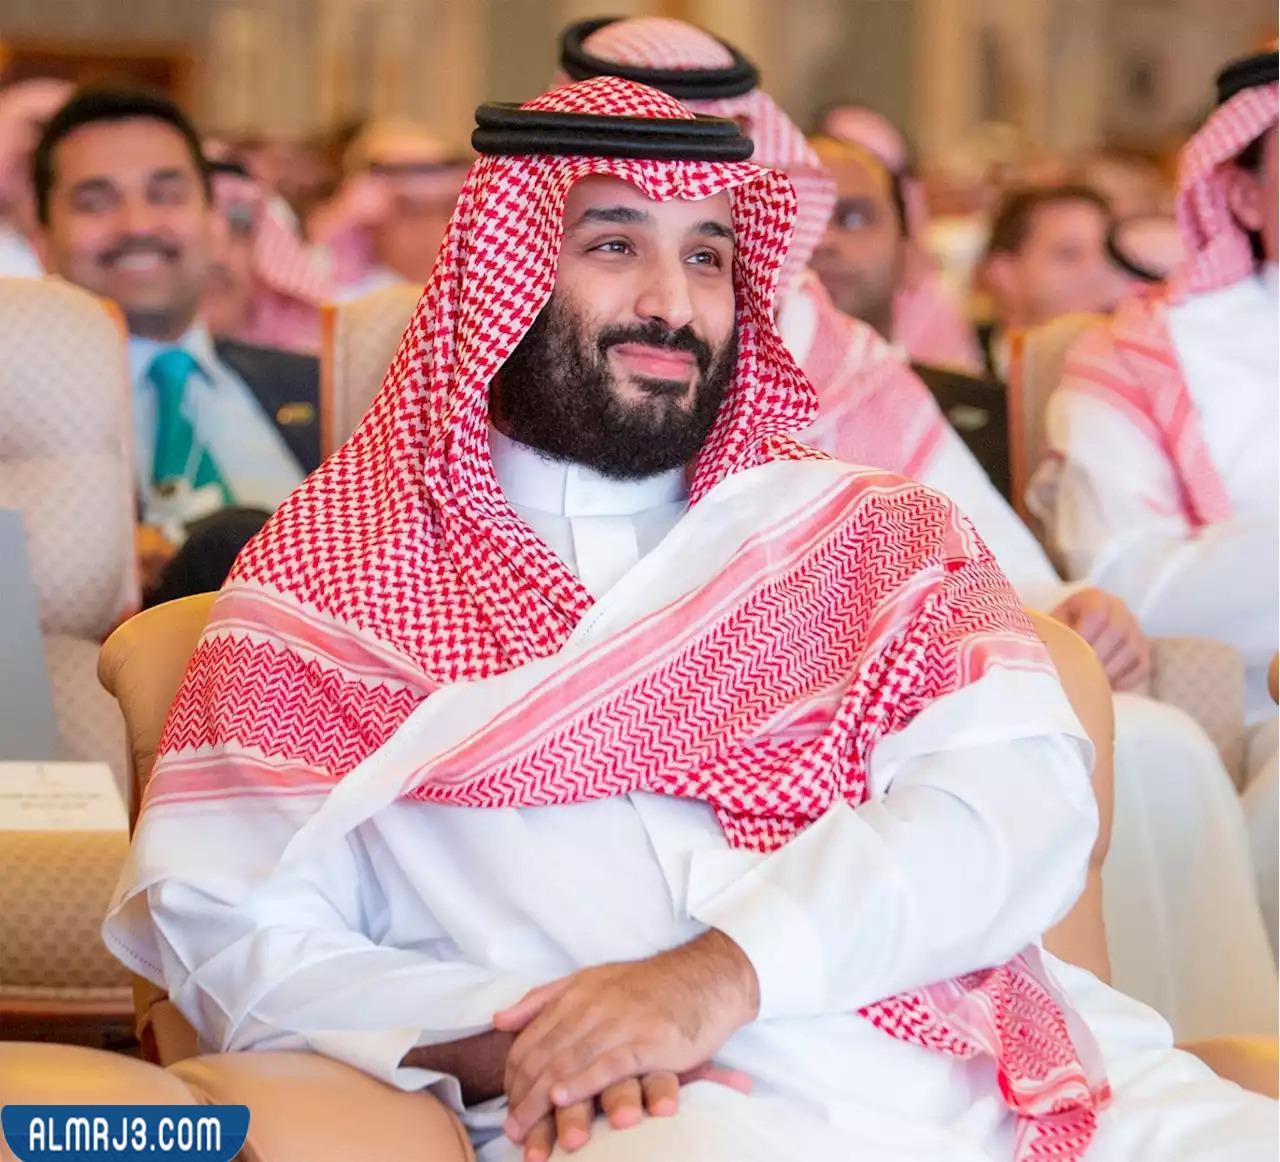 سكرابز الأمير محمد بن سلمان